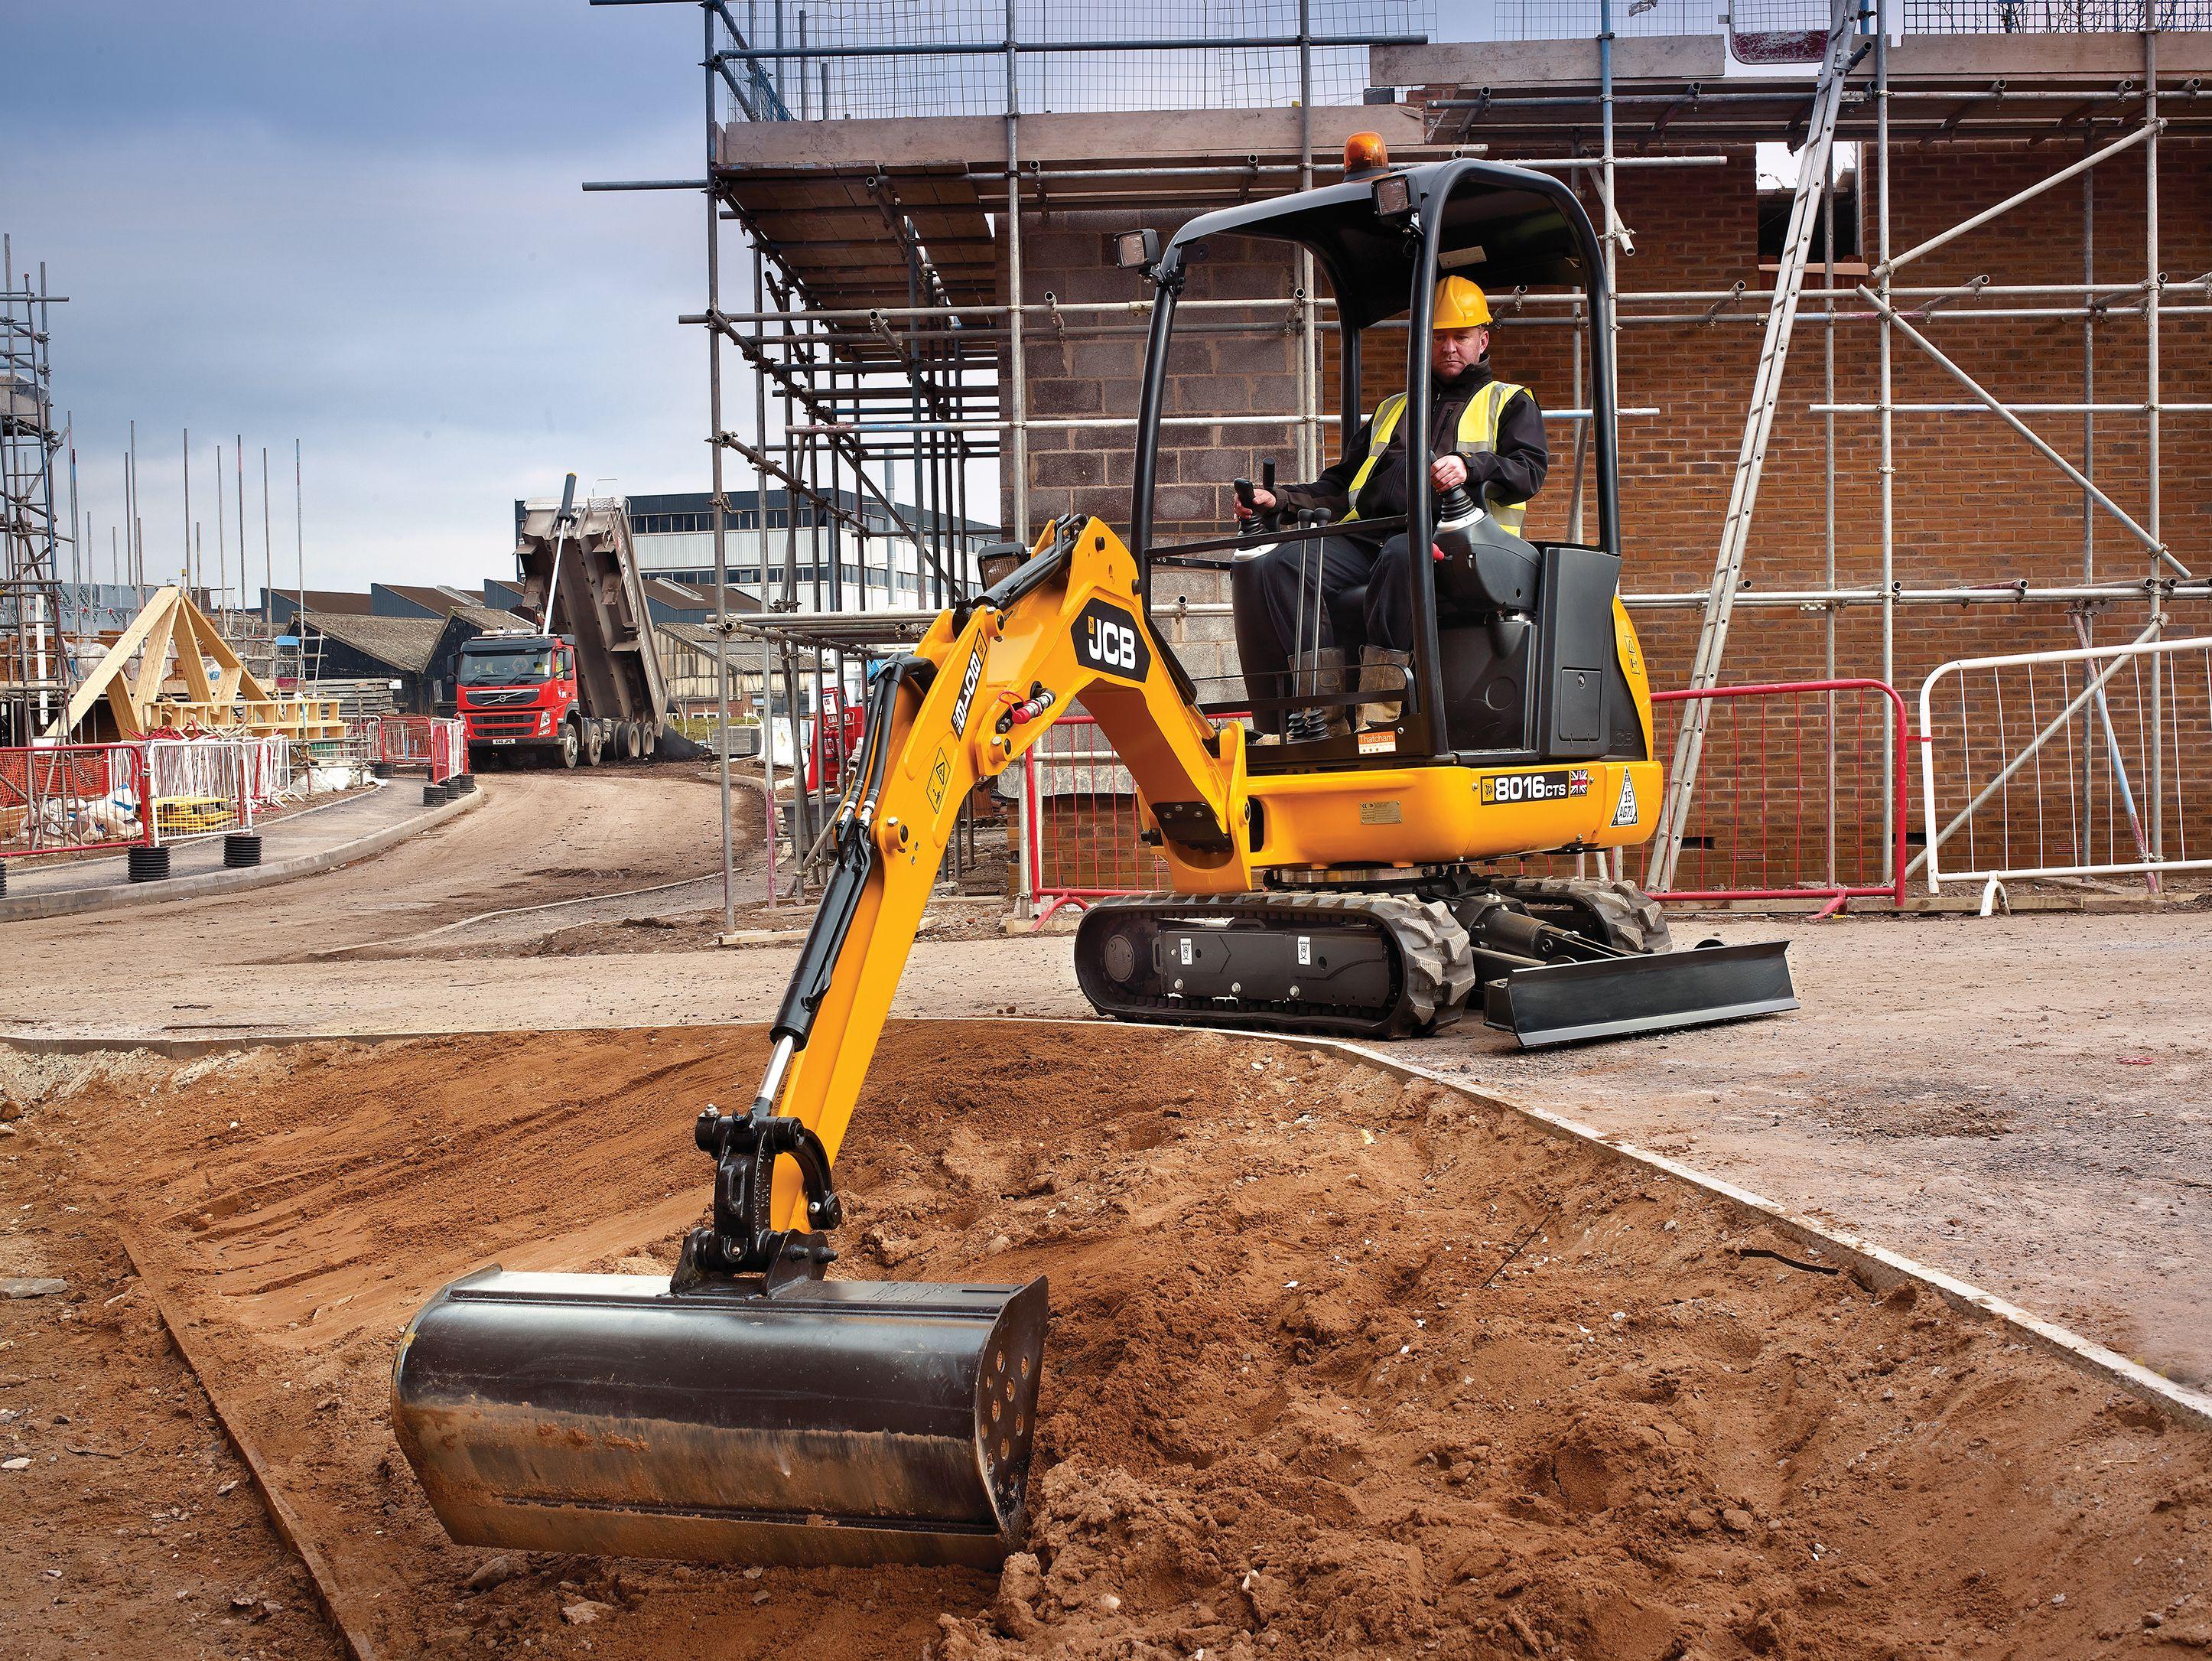 jcb 8016 mini excavator excavator and loader pinterest tractor